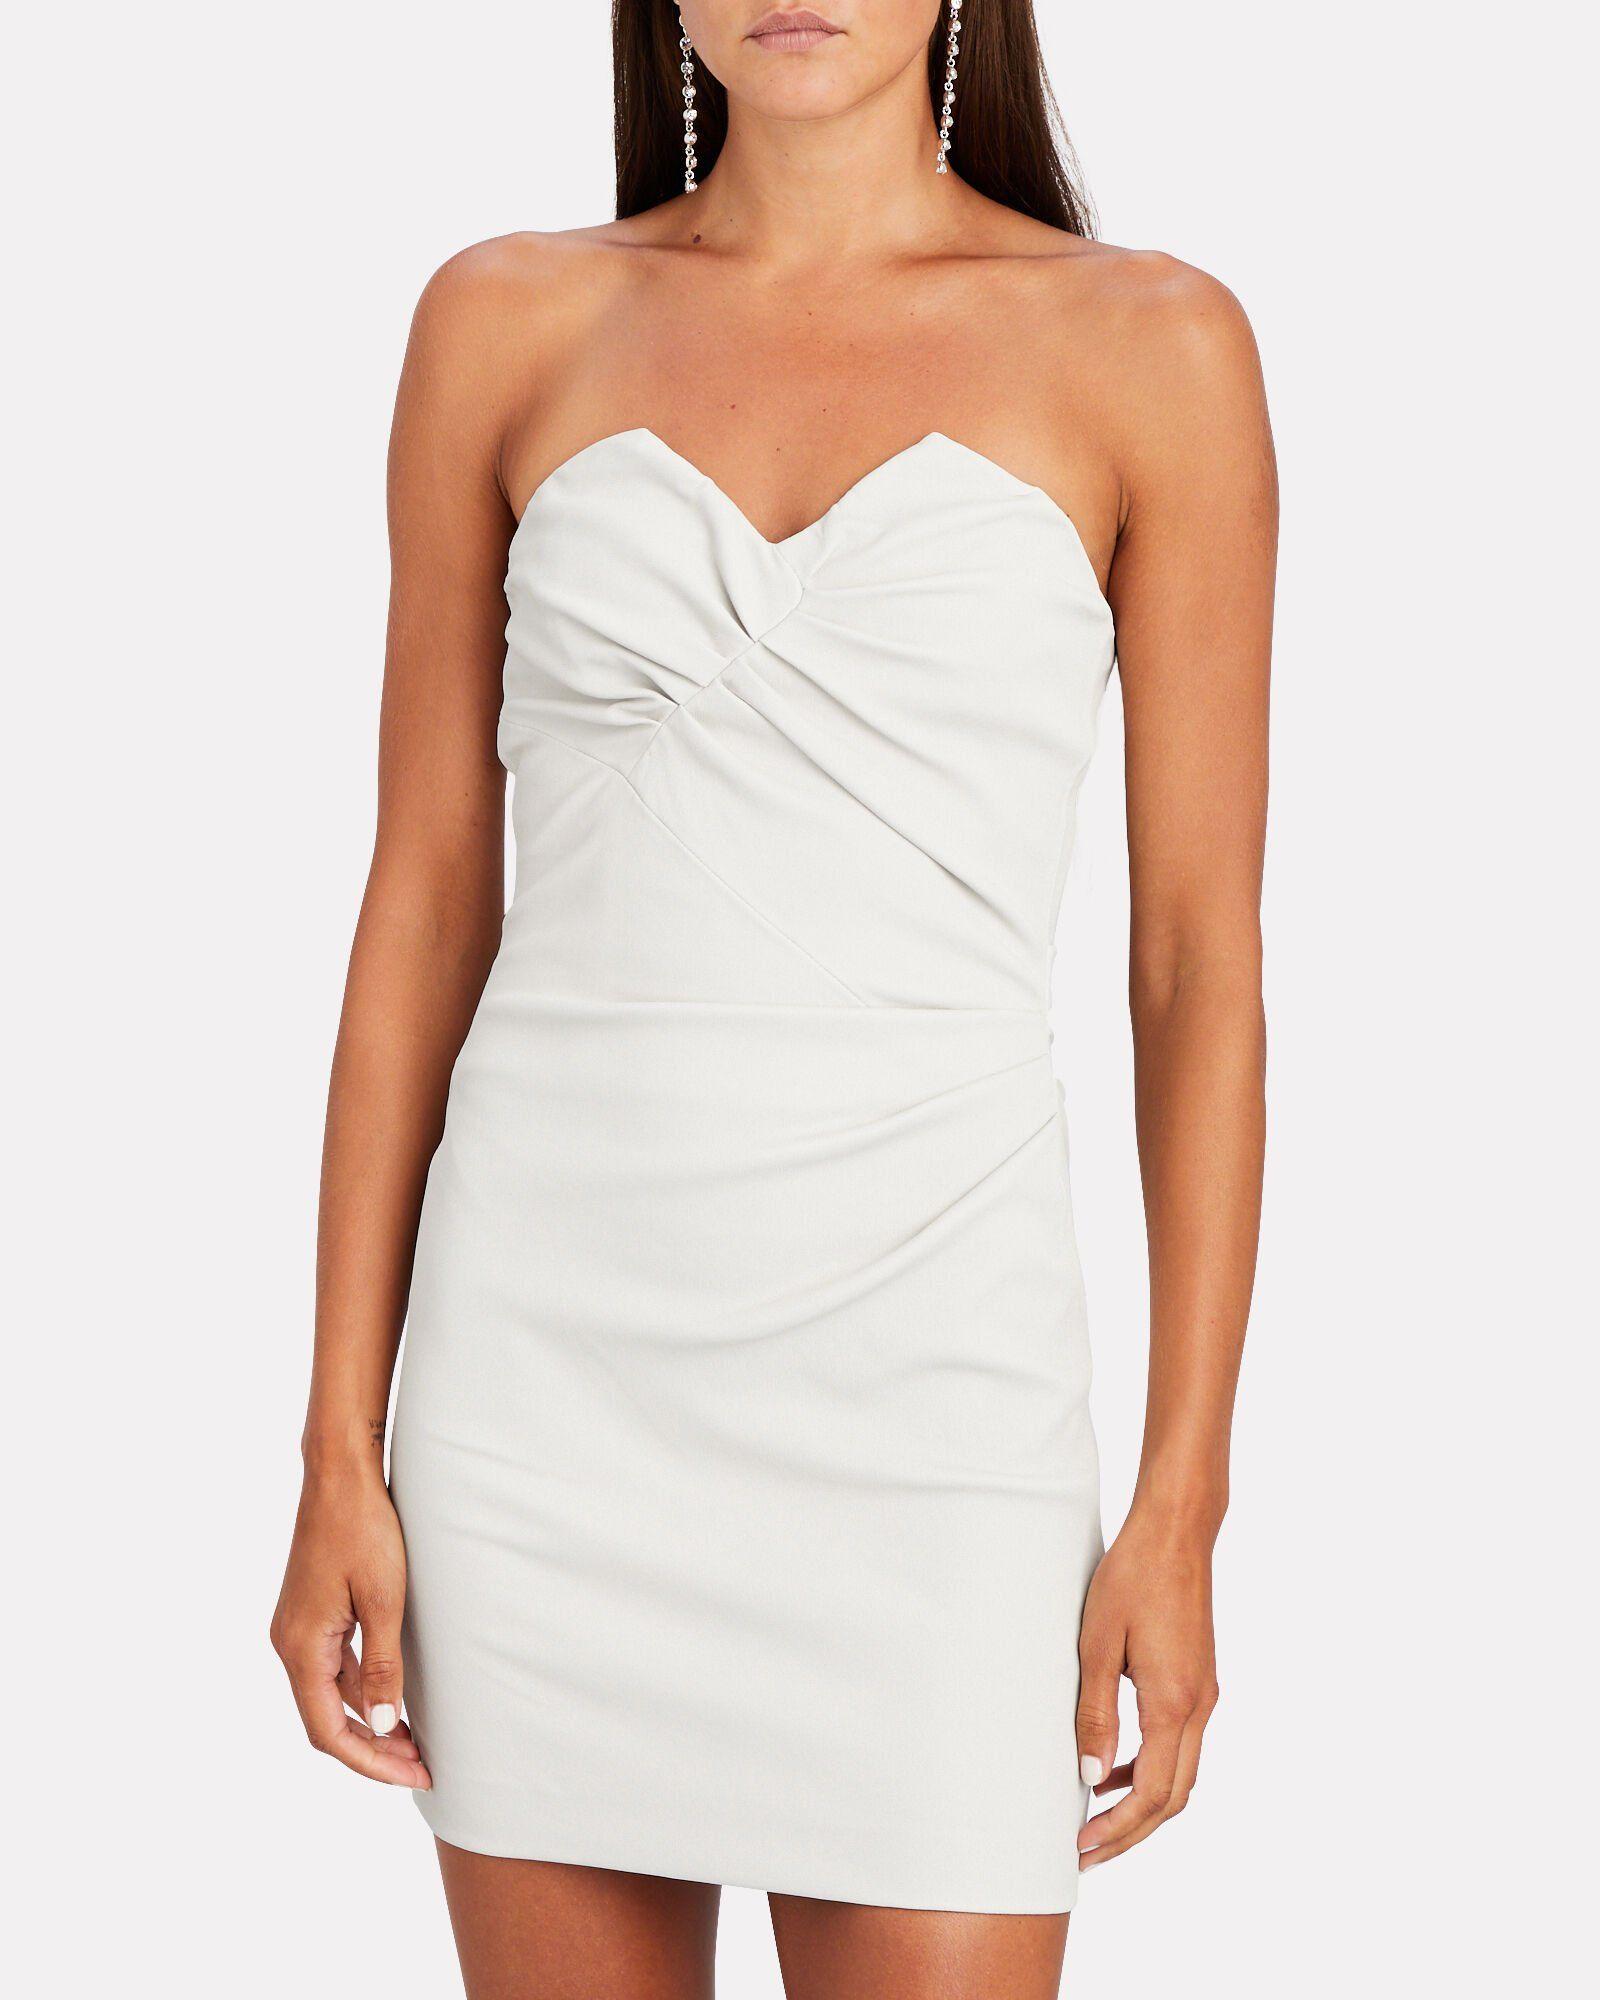 Valana Leather Strapless Mini Dress Strapless Mini Dress Dresses Designer Mini Dresses [ 2000 x 1600 Pixel ]